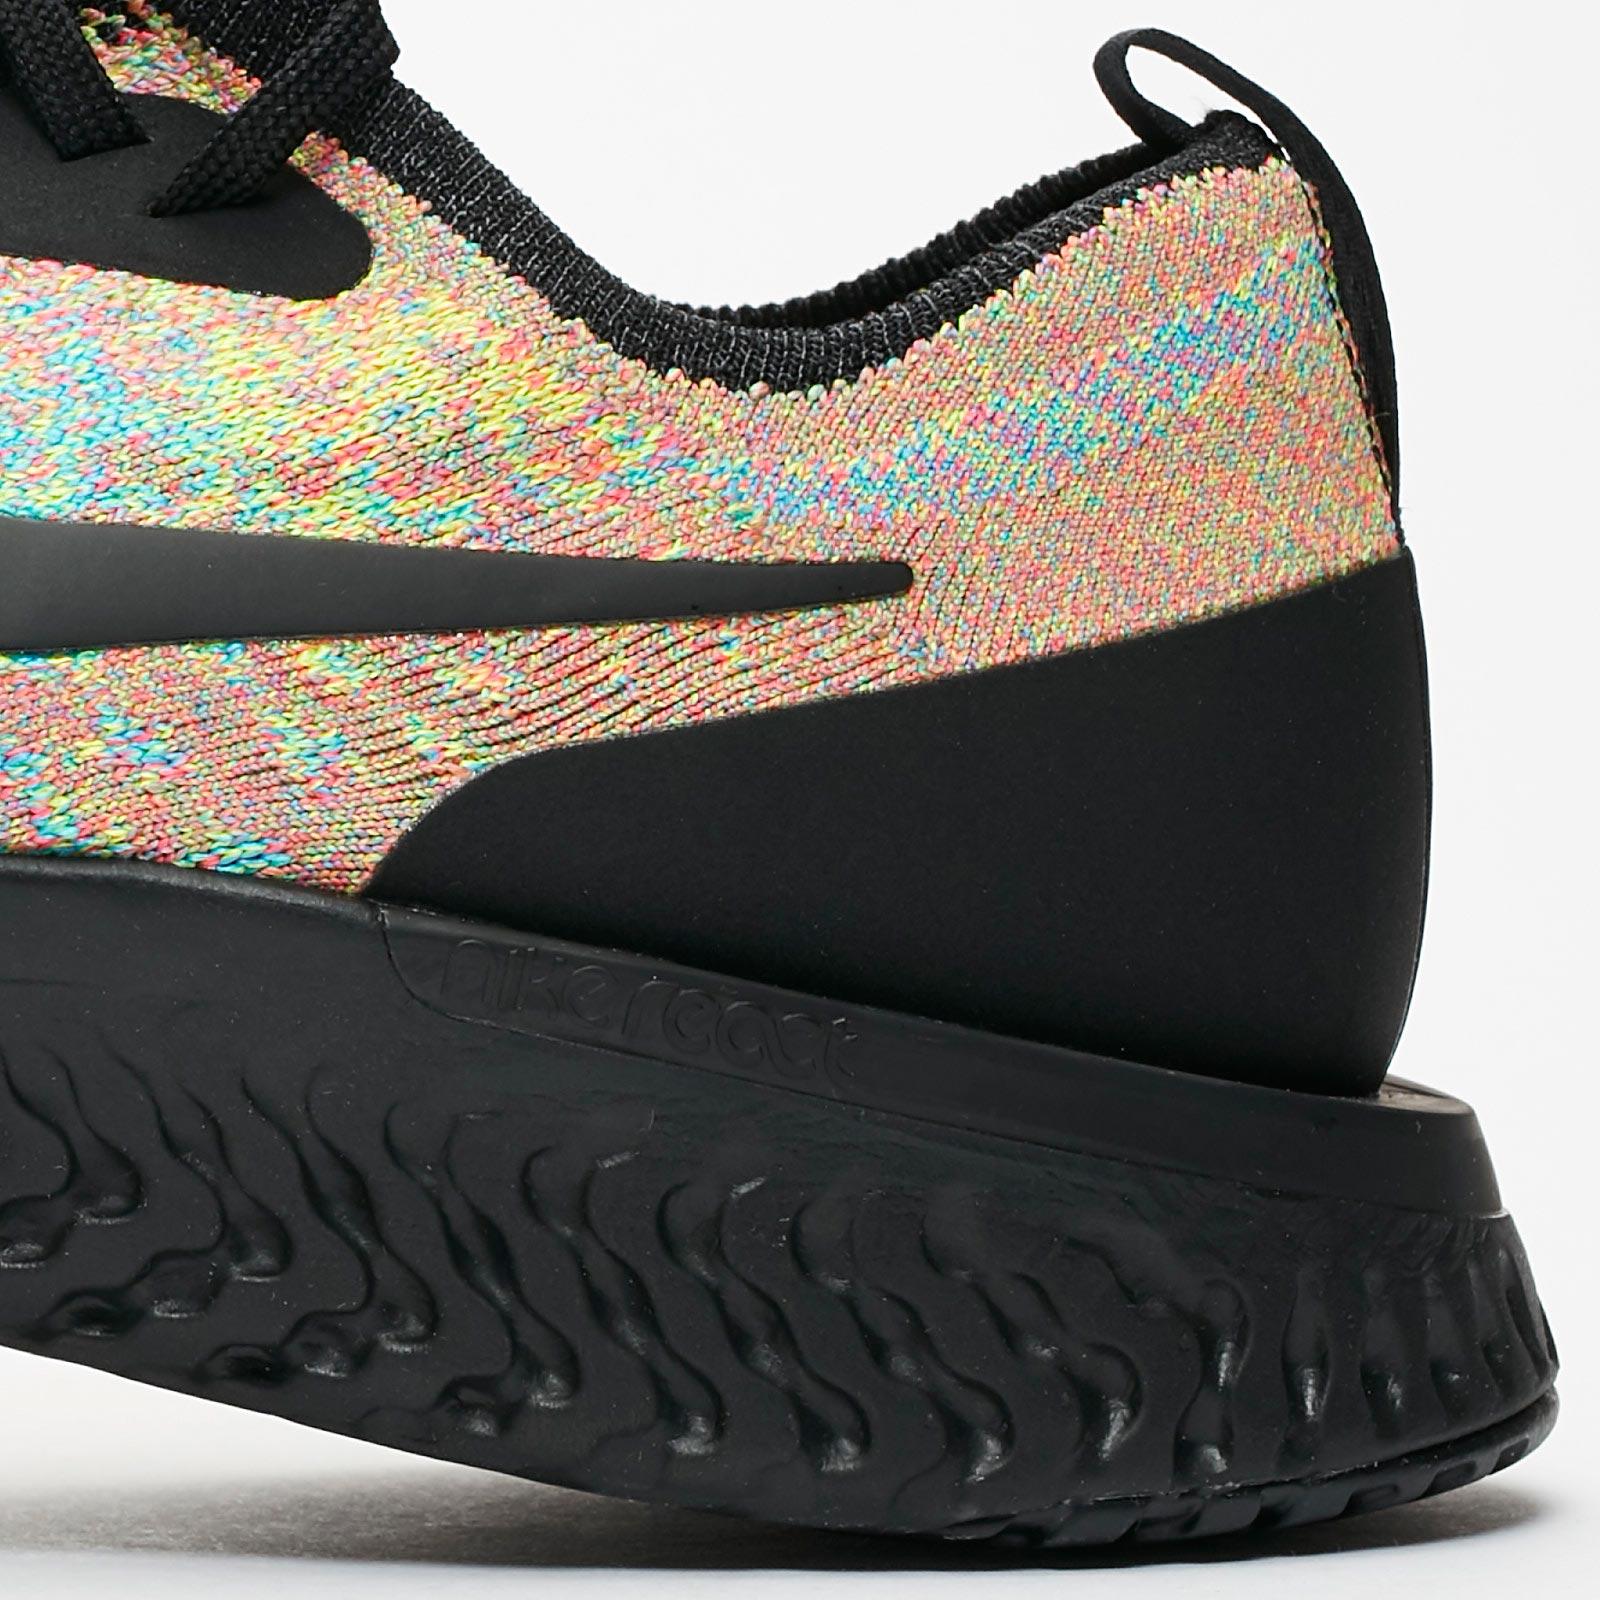 Nike Epic React Flyknit - At6162-001